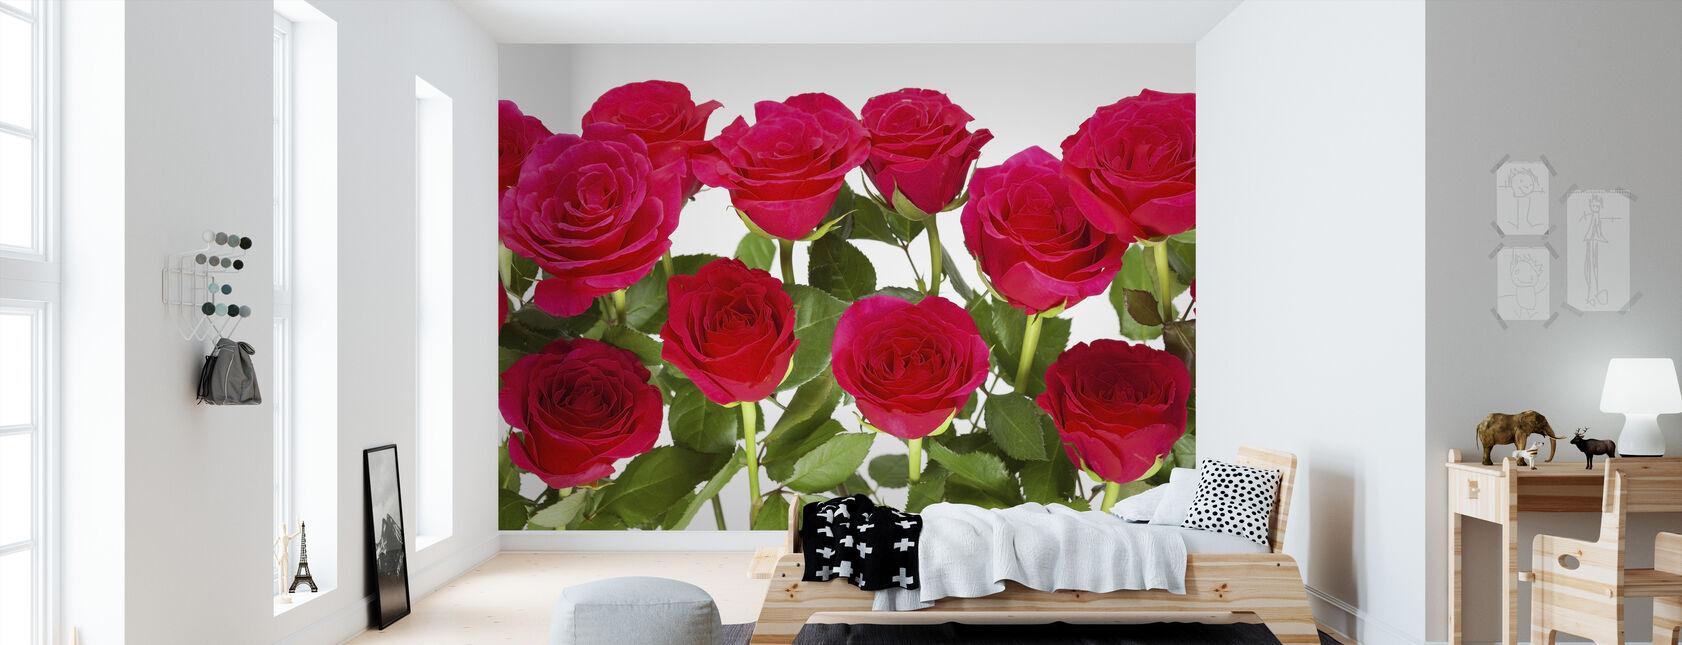 Red Roses - Wallpaper - Kids Room